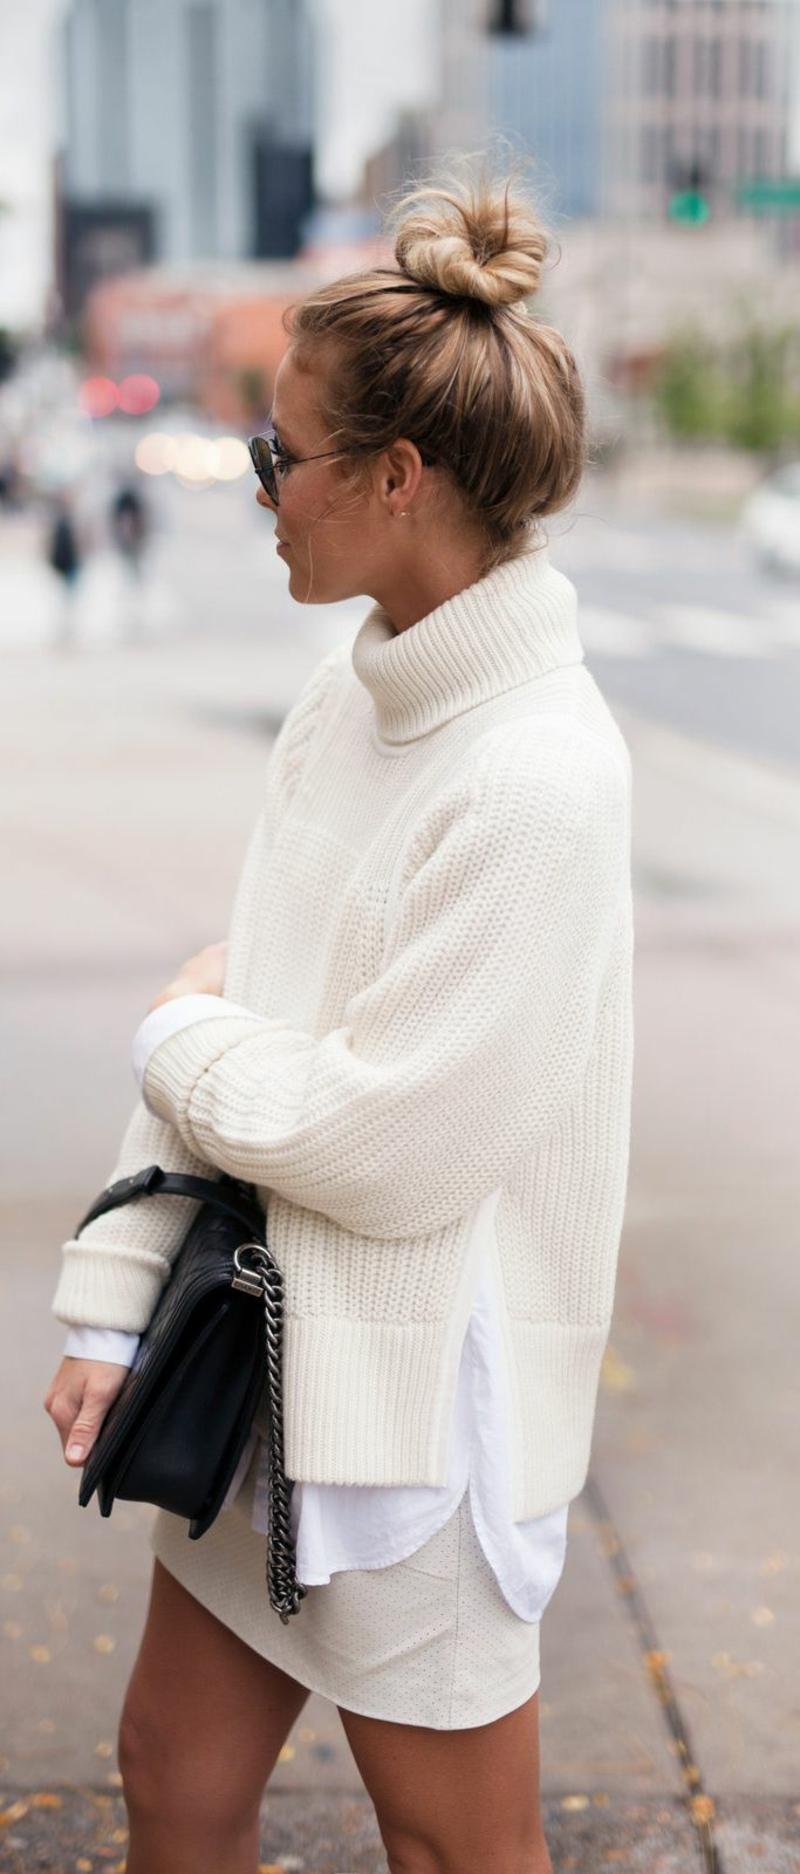 Rollkragenpullover Damen weiß Hemd Minirock casual Style